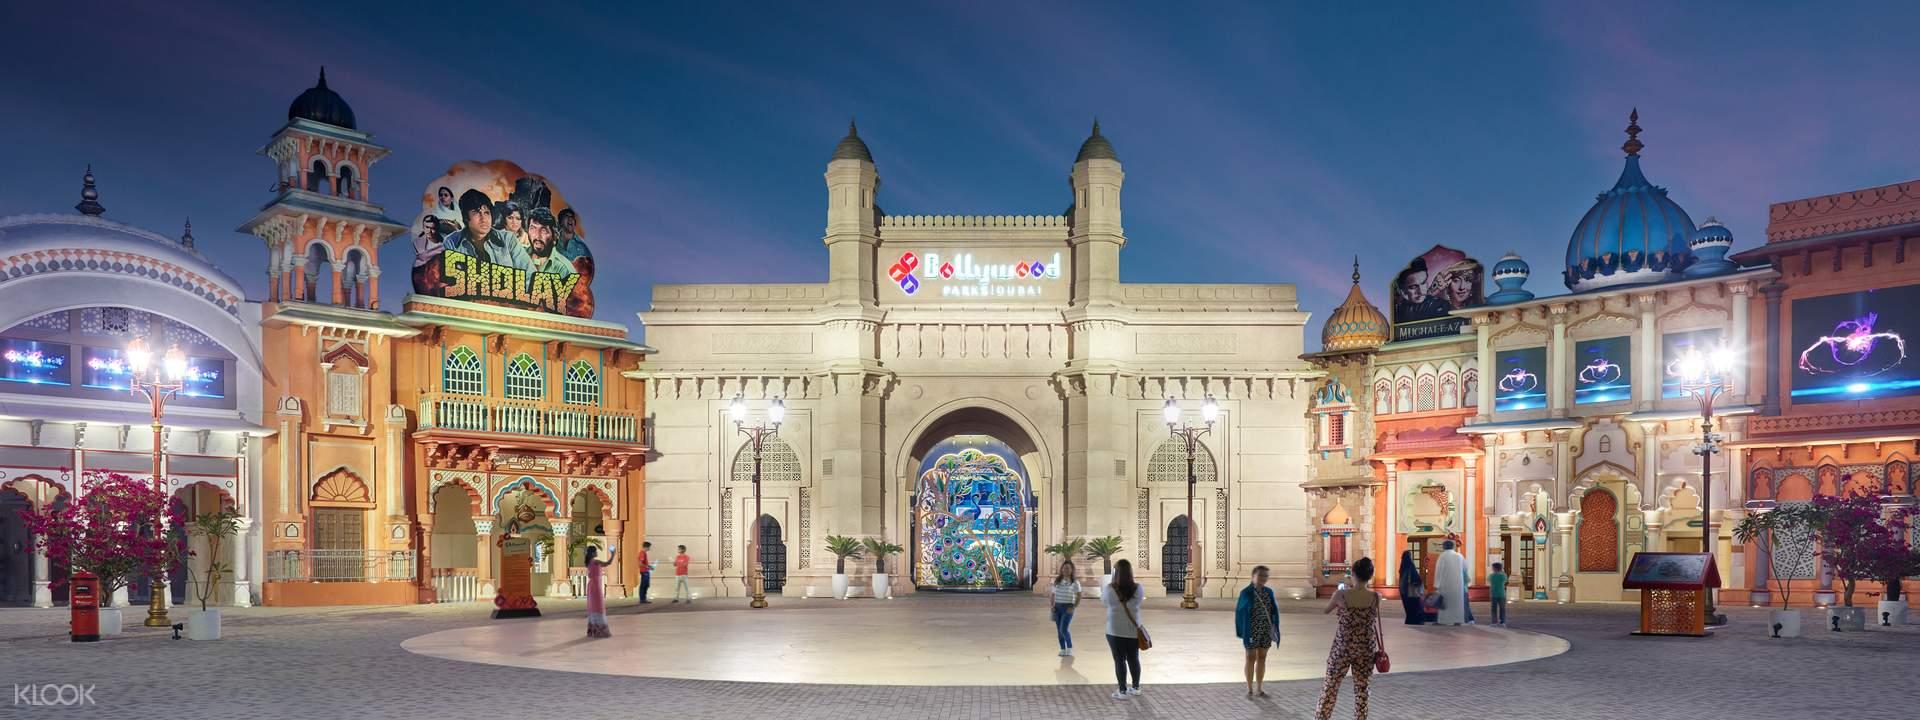 Dubai Parks and Resorts Day Pass (Legoland, Motiongate